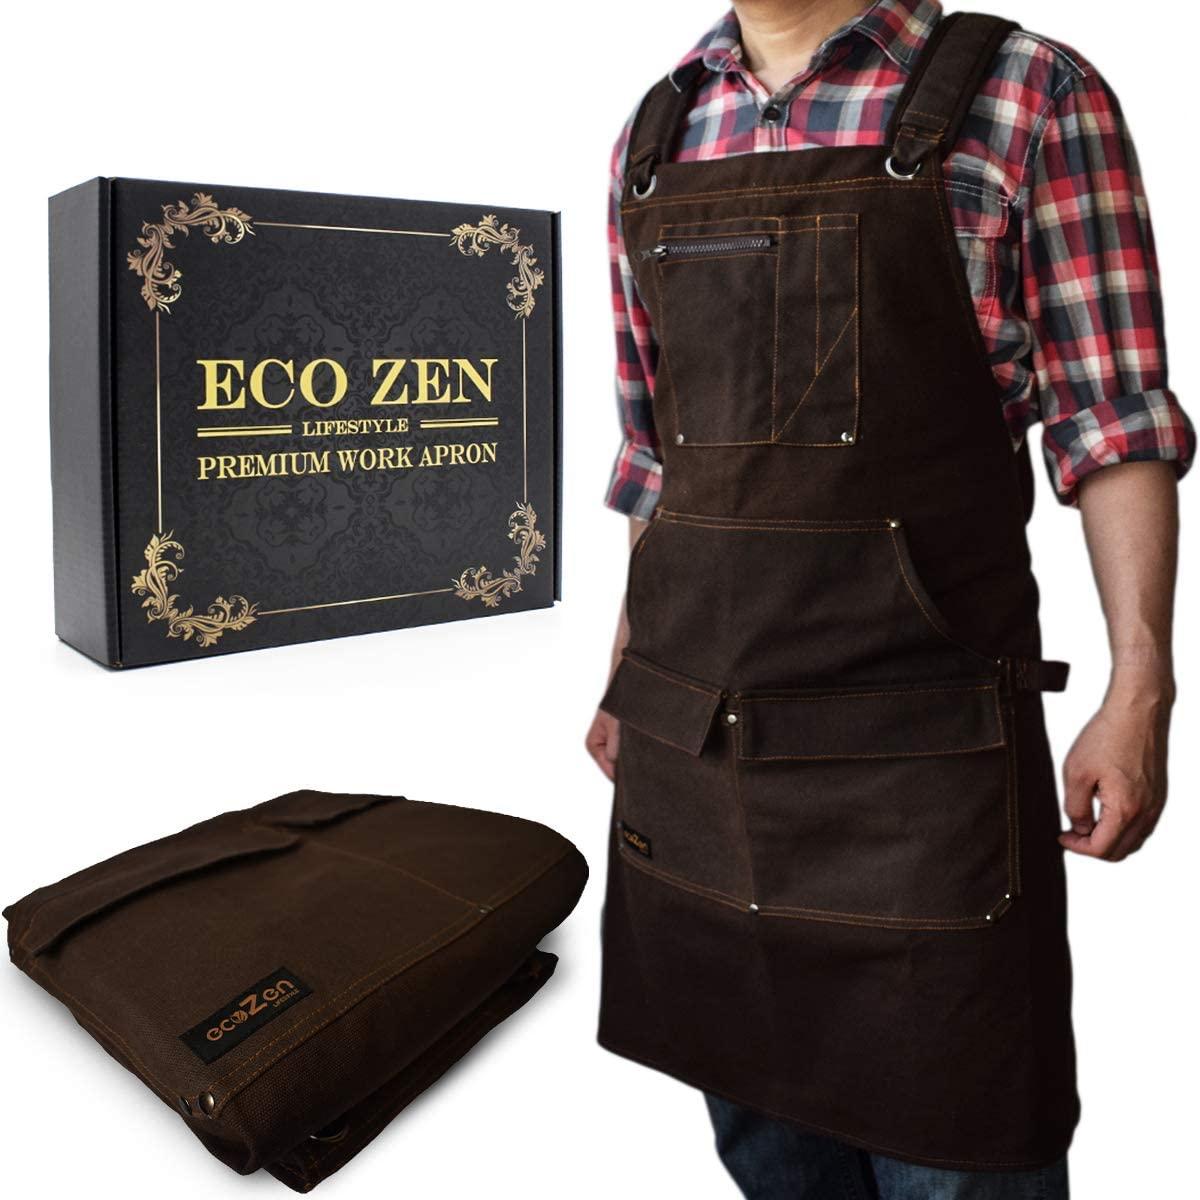 EcoZen Lifestyle Woodworking Shop Apron